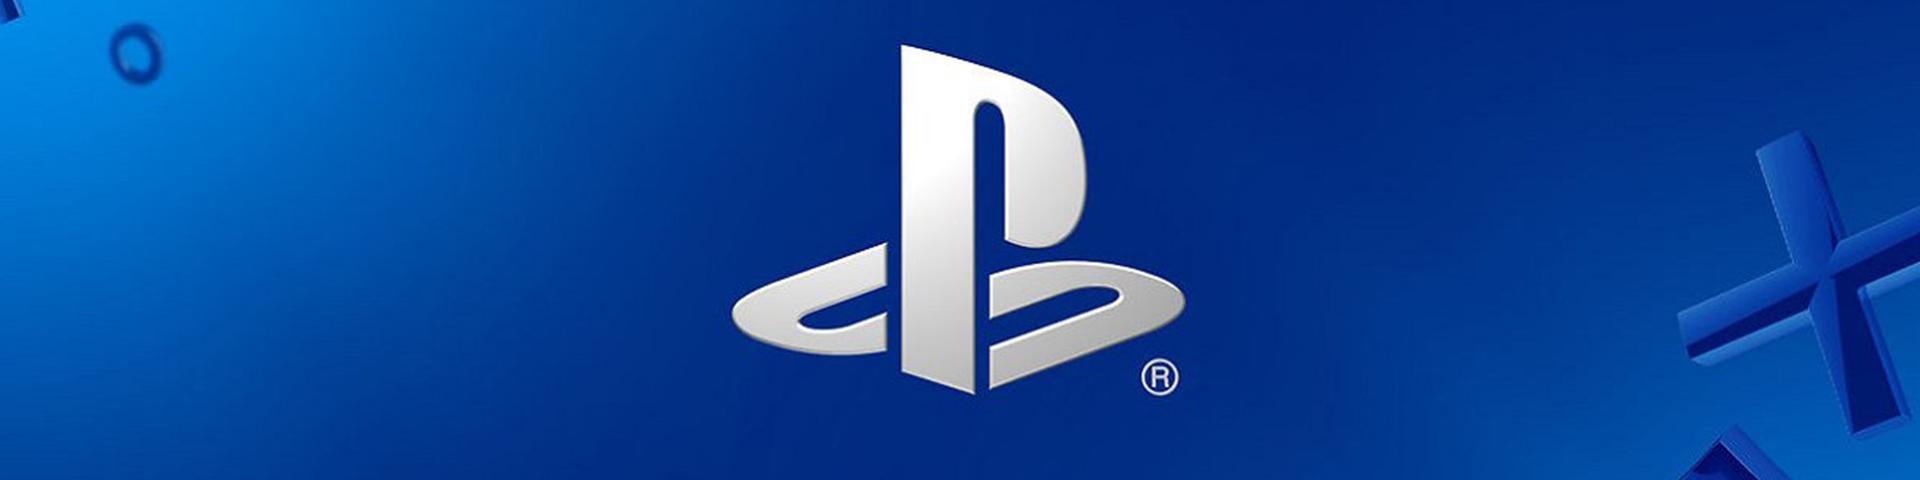 PSN name changes header.png